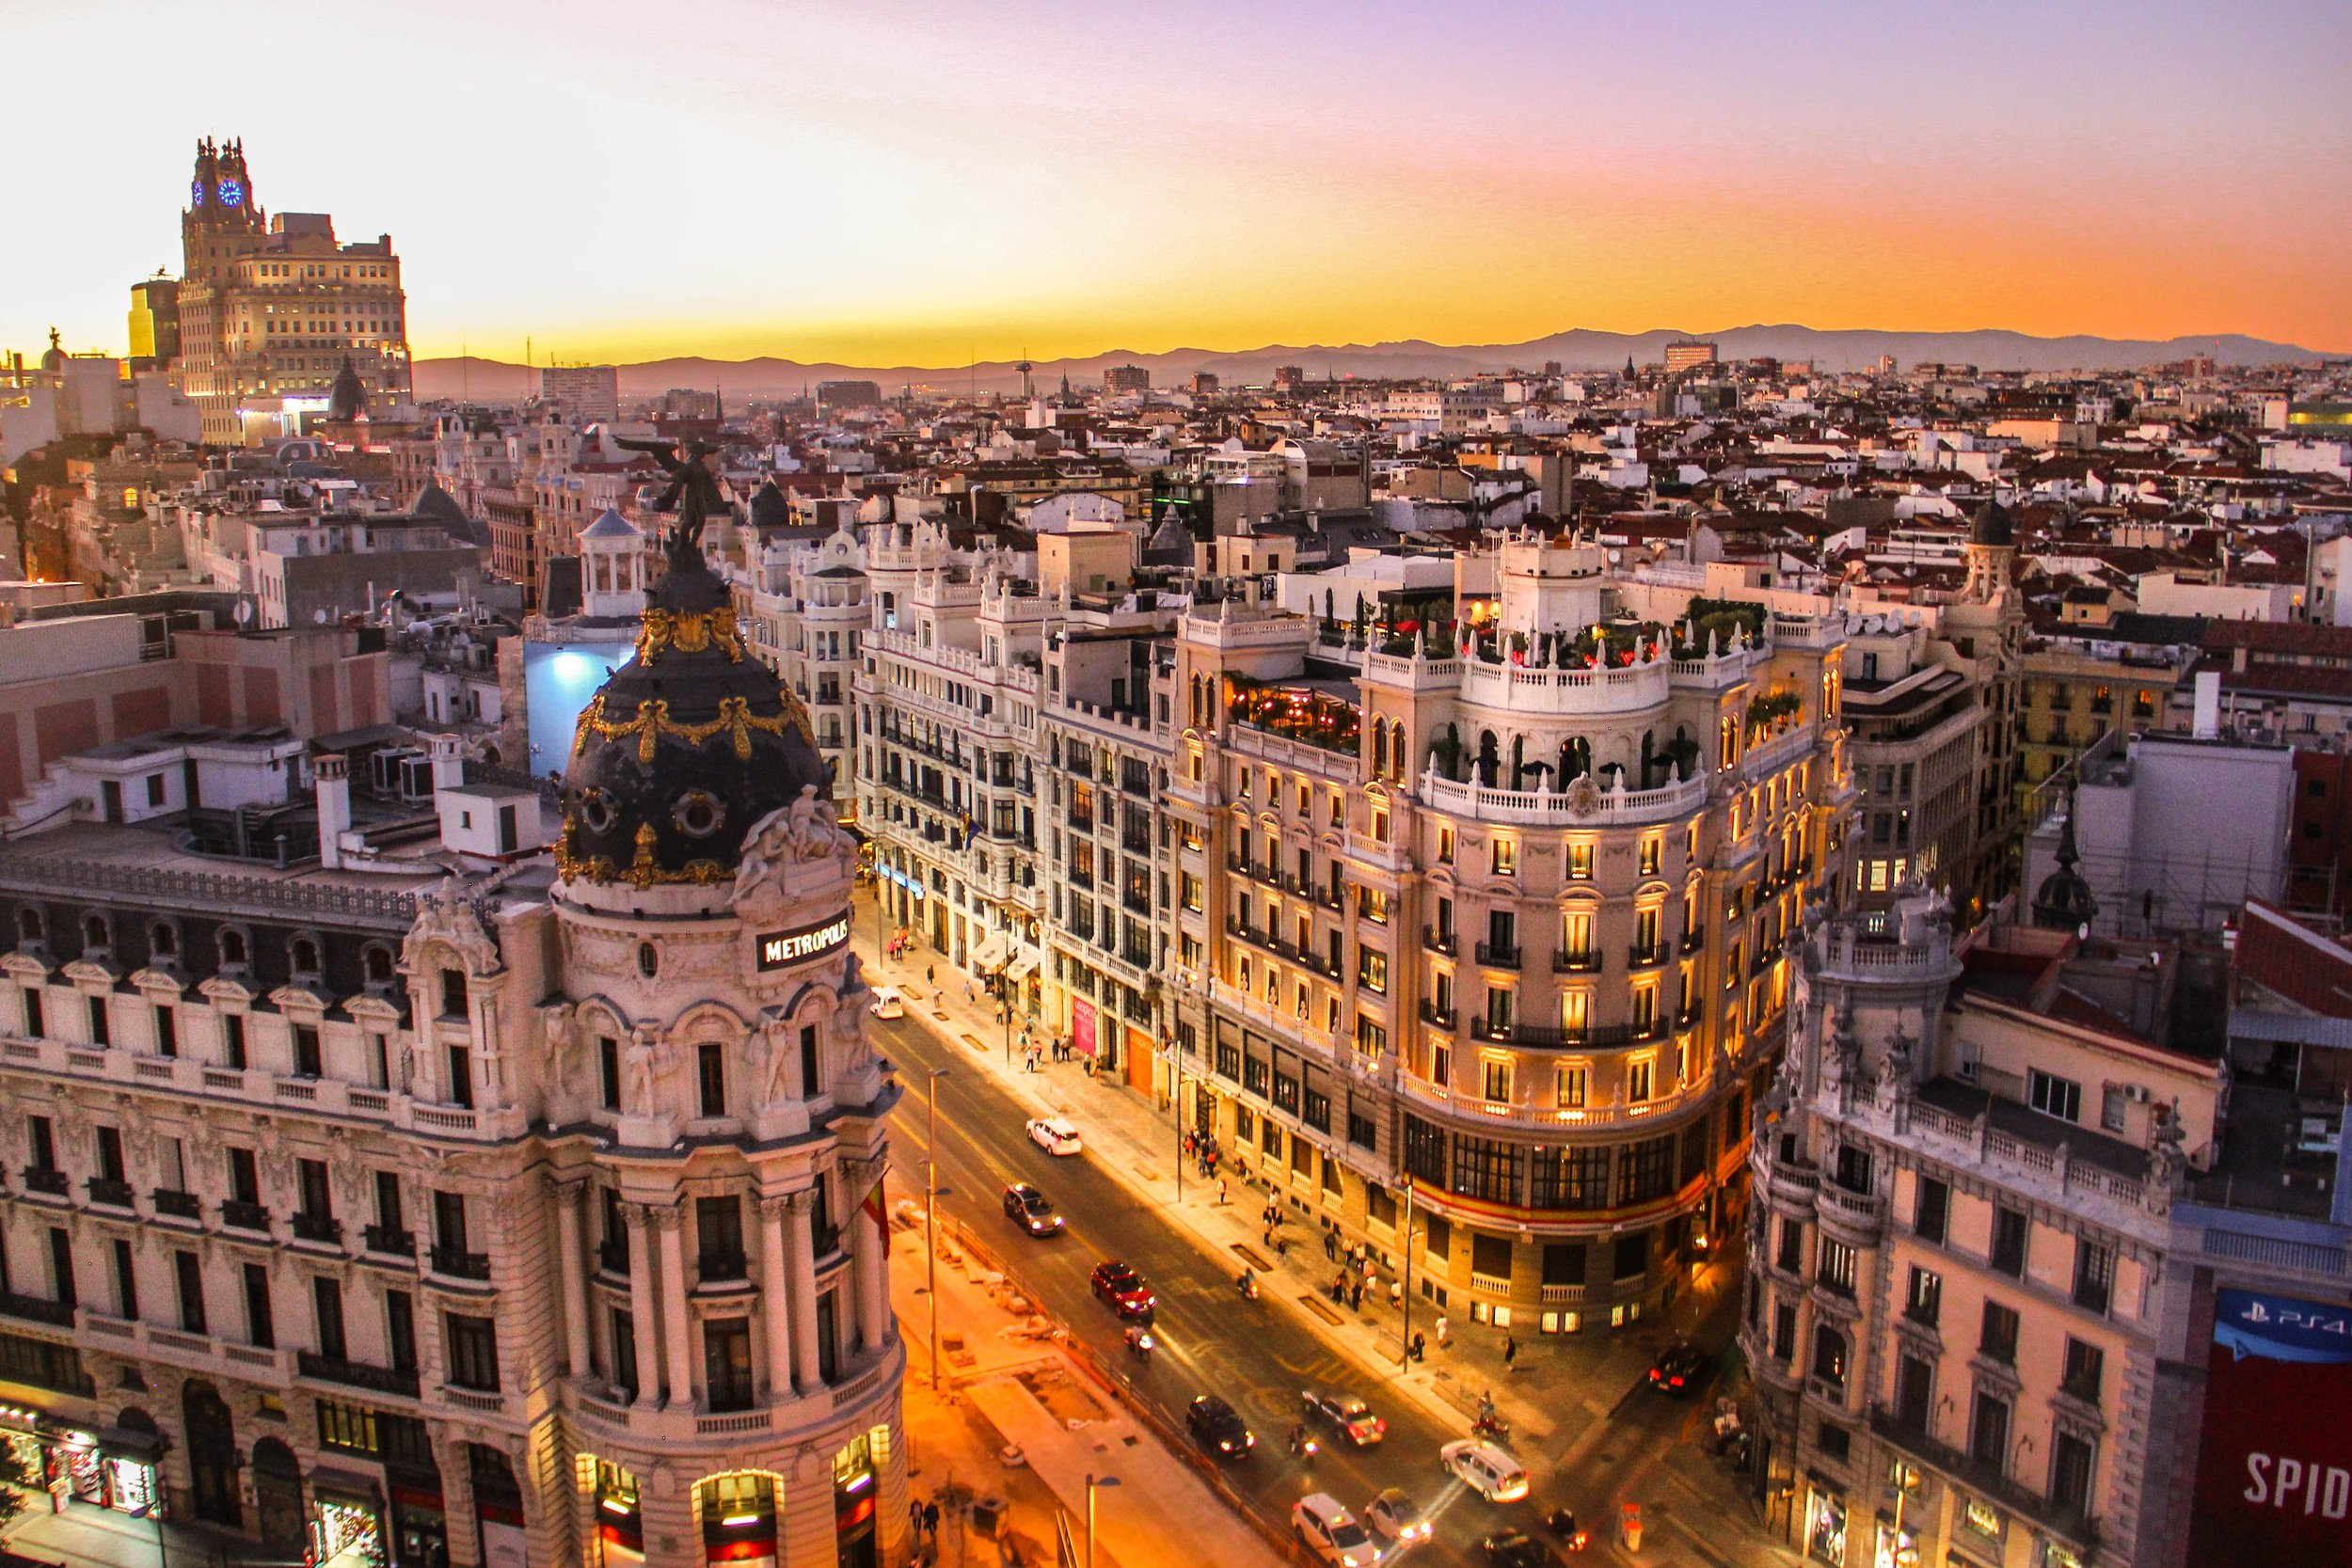 Central Spain & Valencia